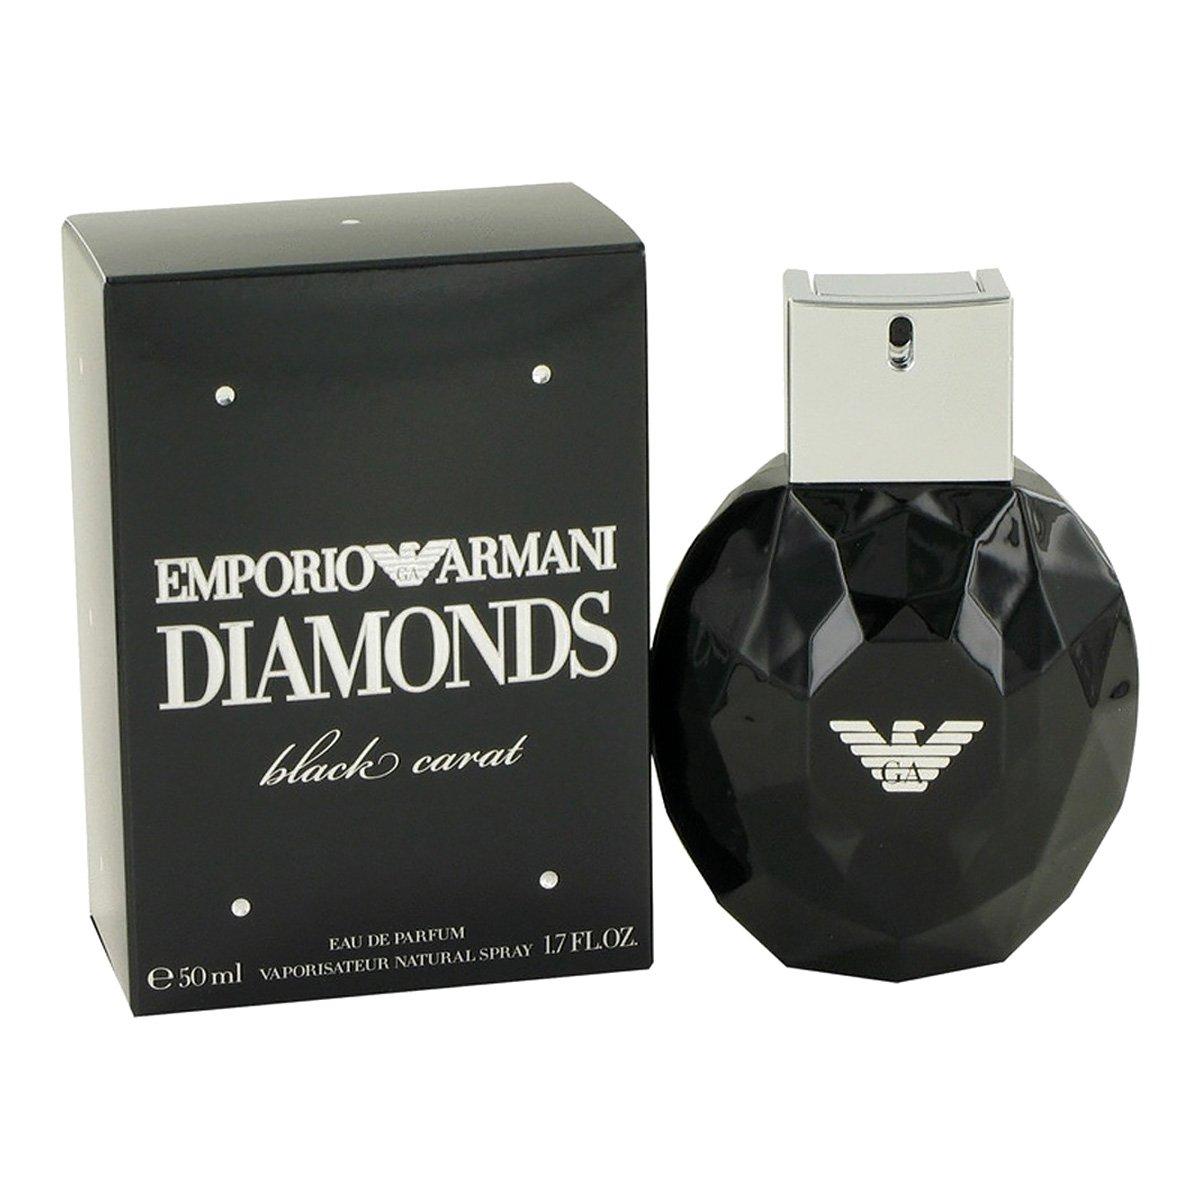 Giorgio Armani Emporio Diamonds Black Carat